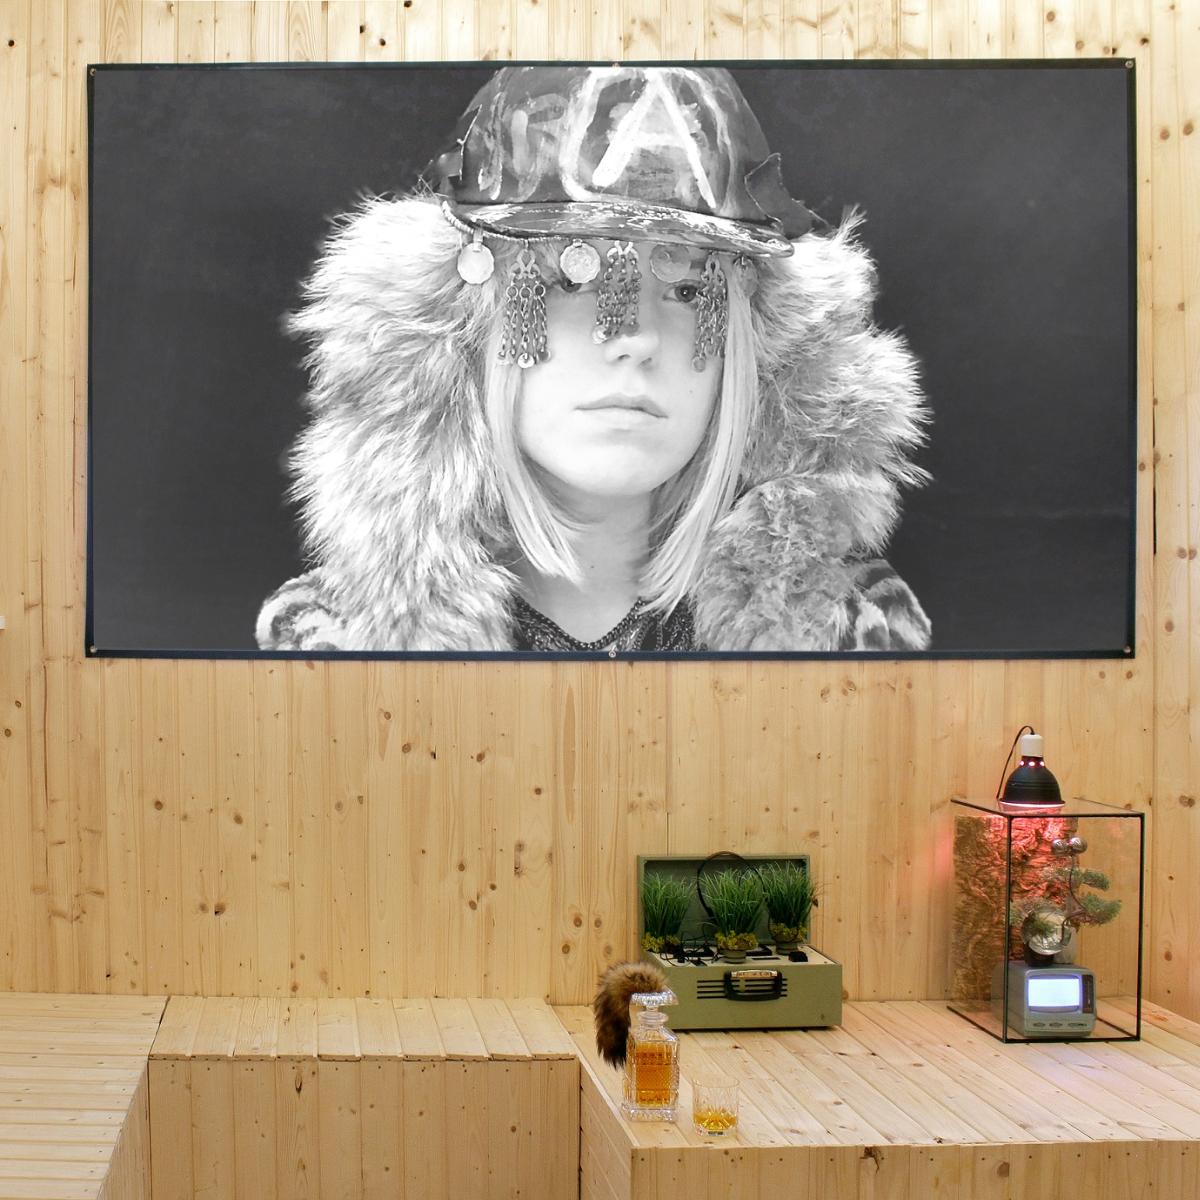 L. E. O. P. A. R. T., 2019, video installation  @Haverkampf Gallery, Berlin